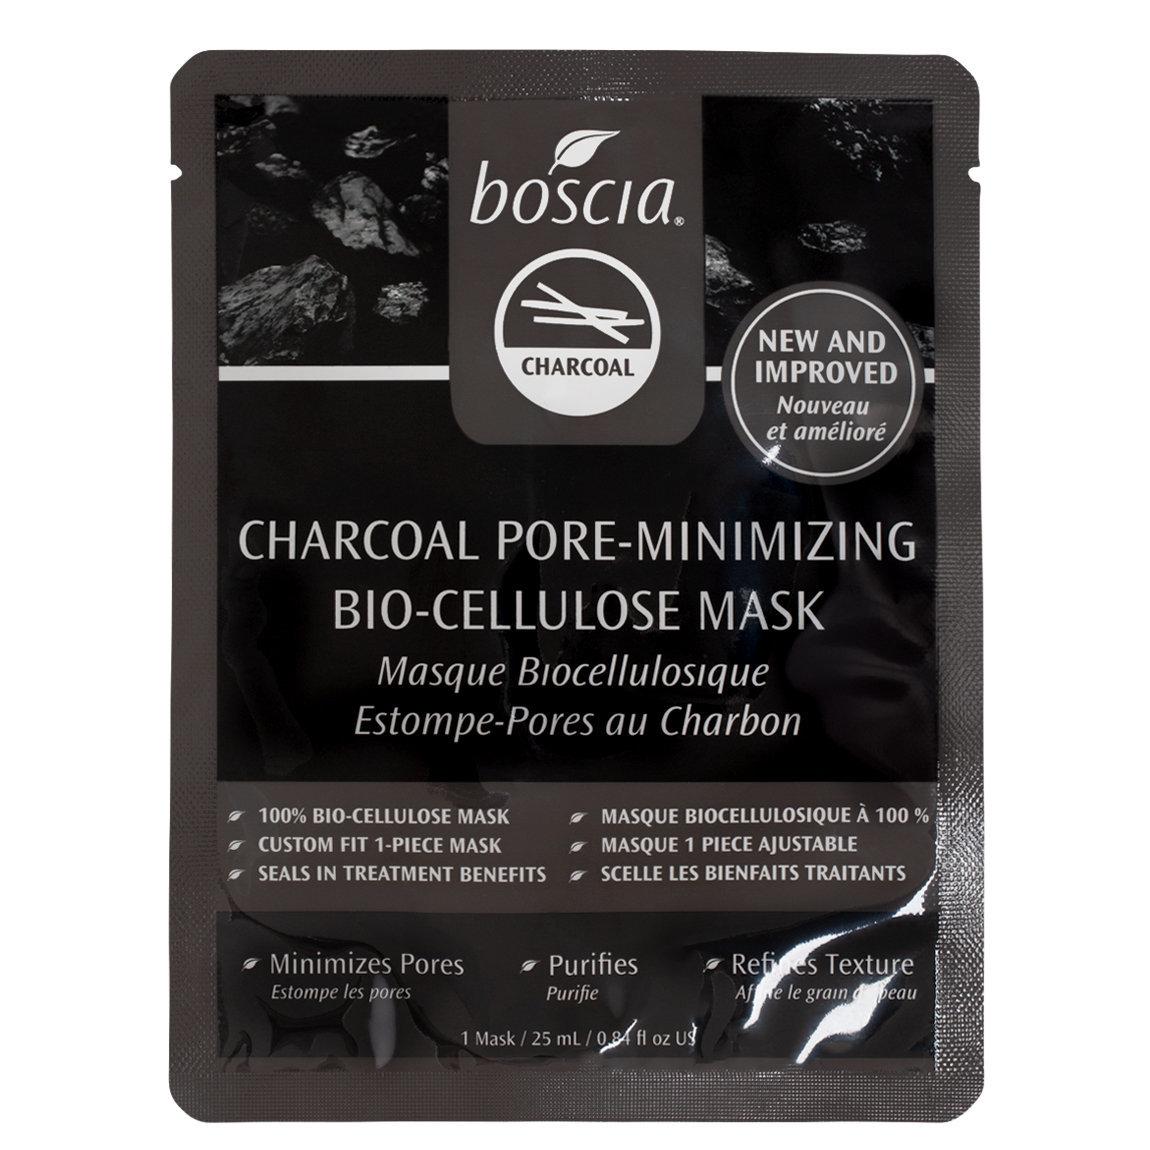 boscia Charcoal Pore Minimizing Bio-Cellulose Mask product swatch.